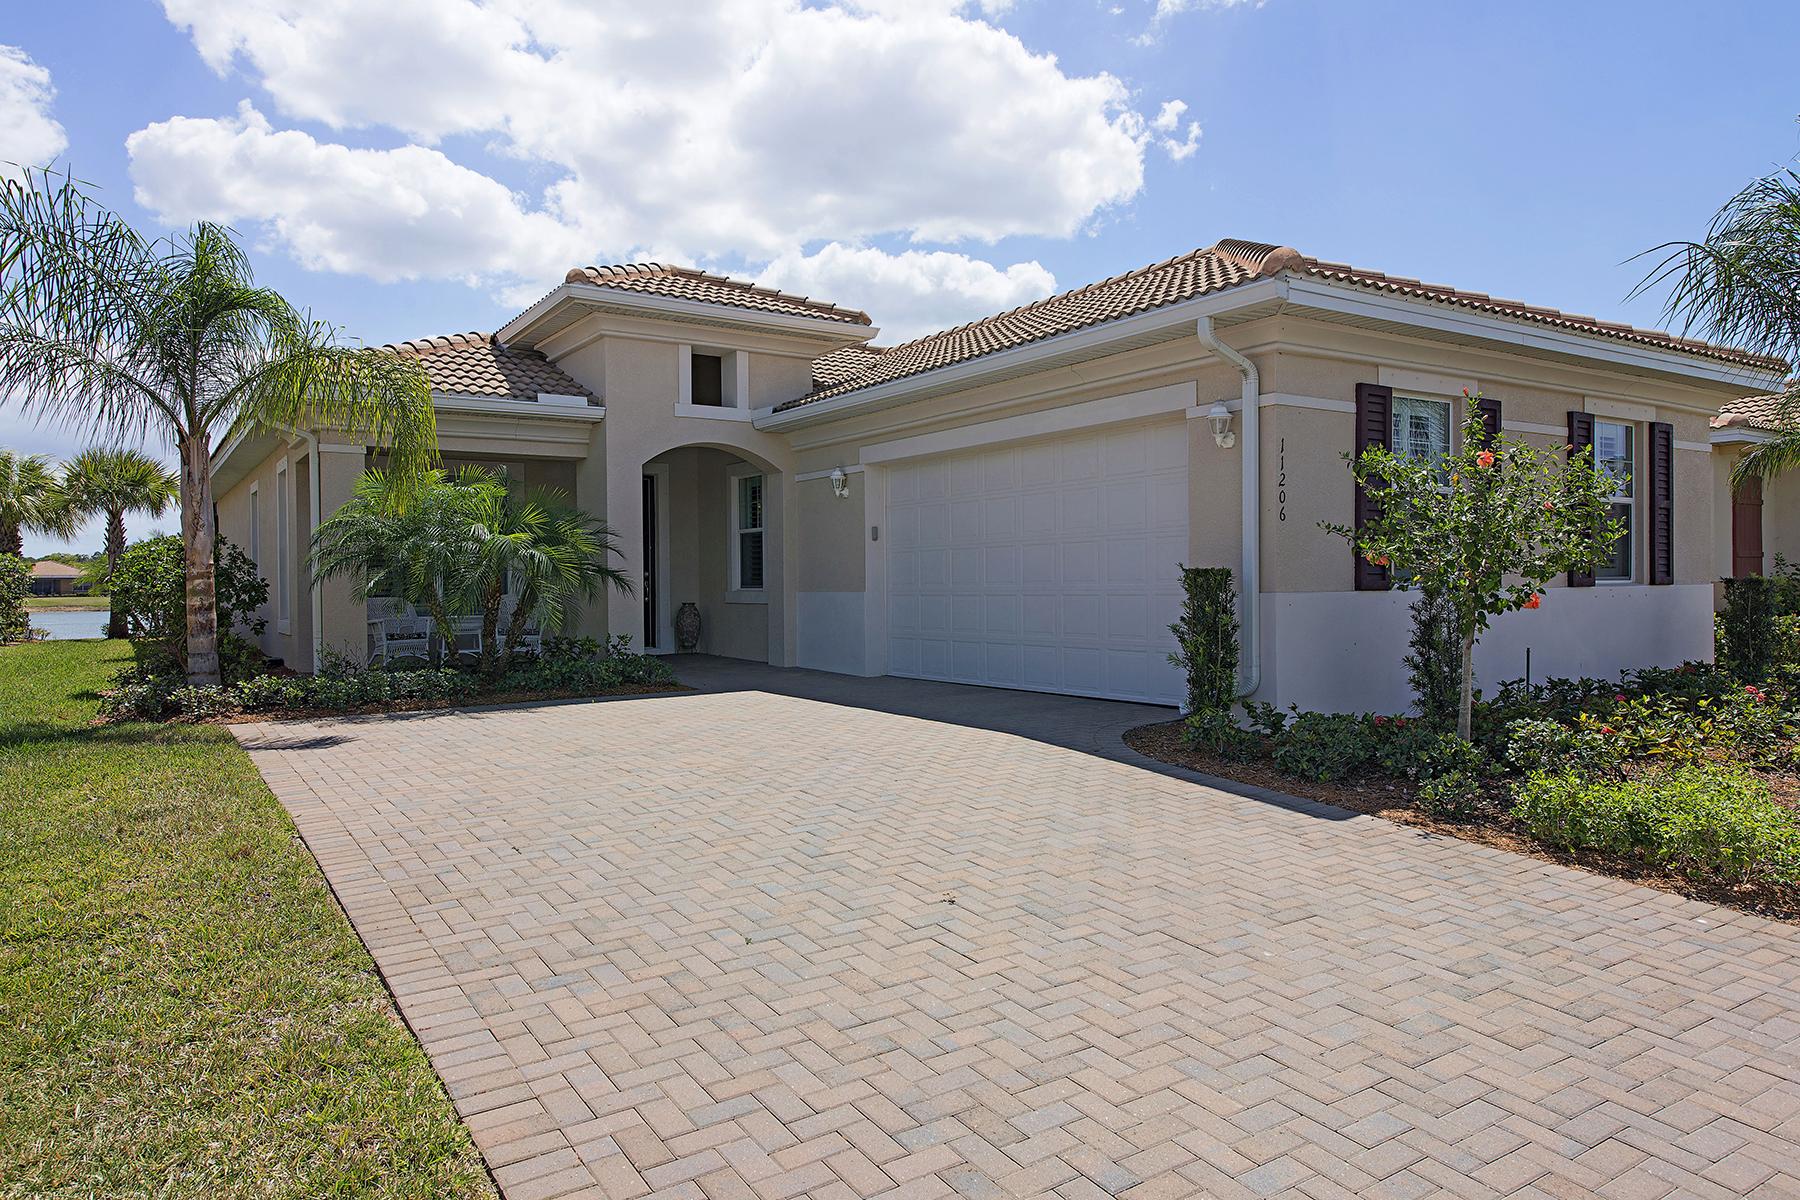 獨棟家庭住宅 為 出售 在 PELICAN PRESERVE - CARENA 11206 Vitale Way Fort Myers, 佛羅里達州, 33913 美國